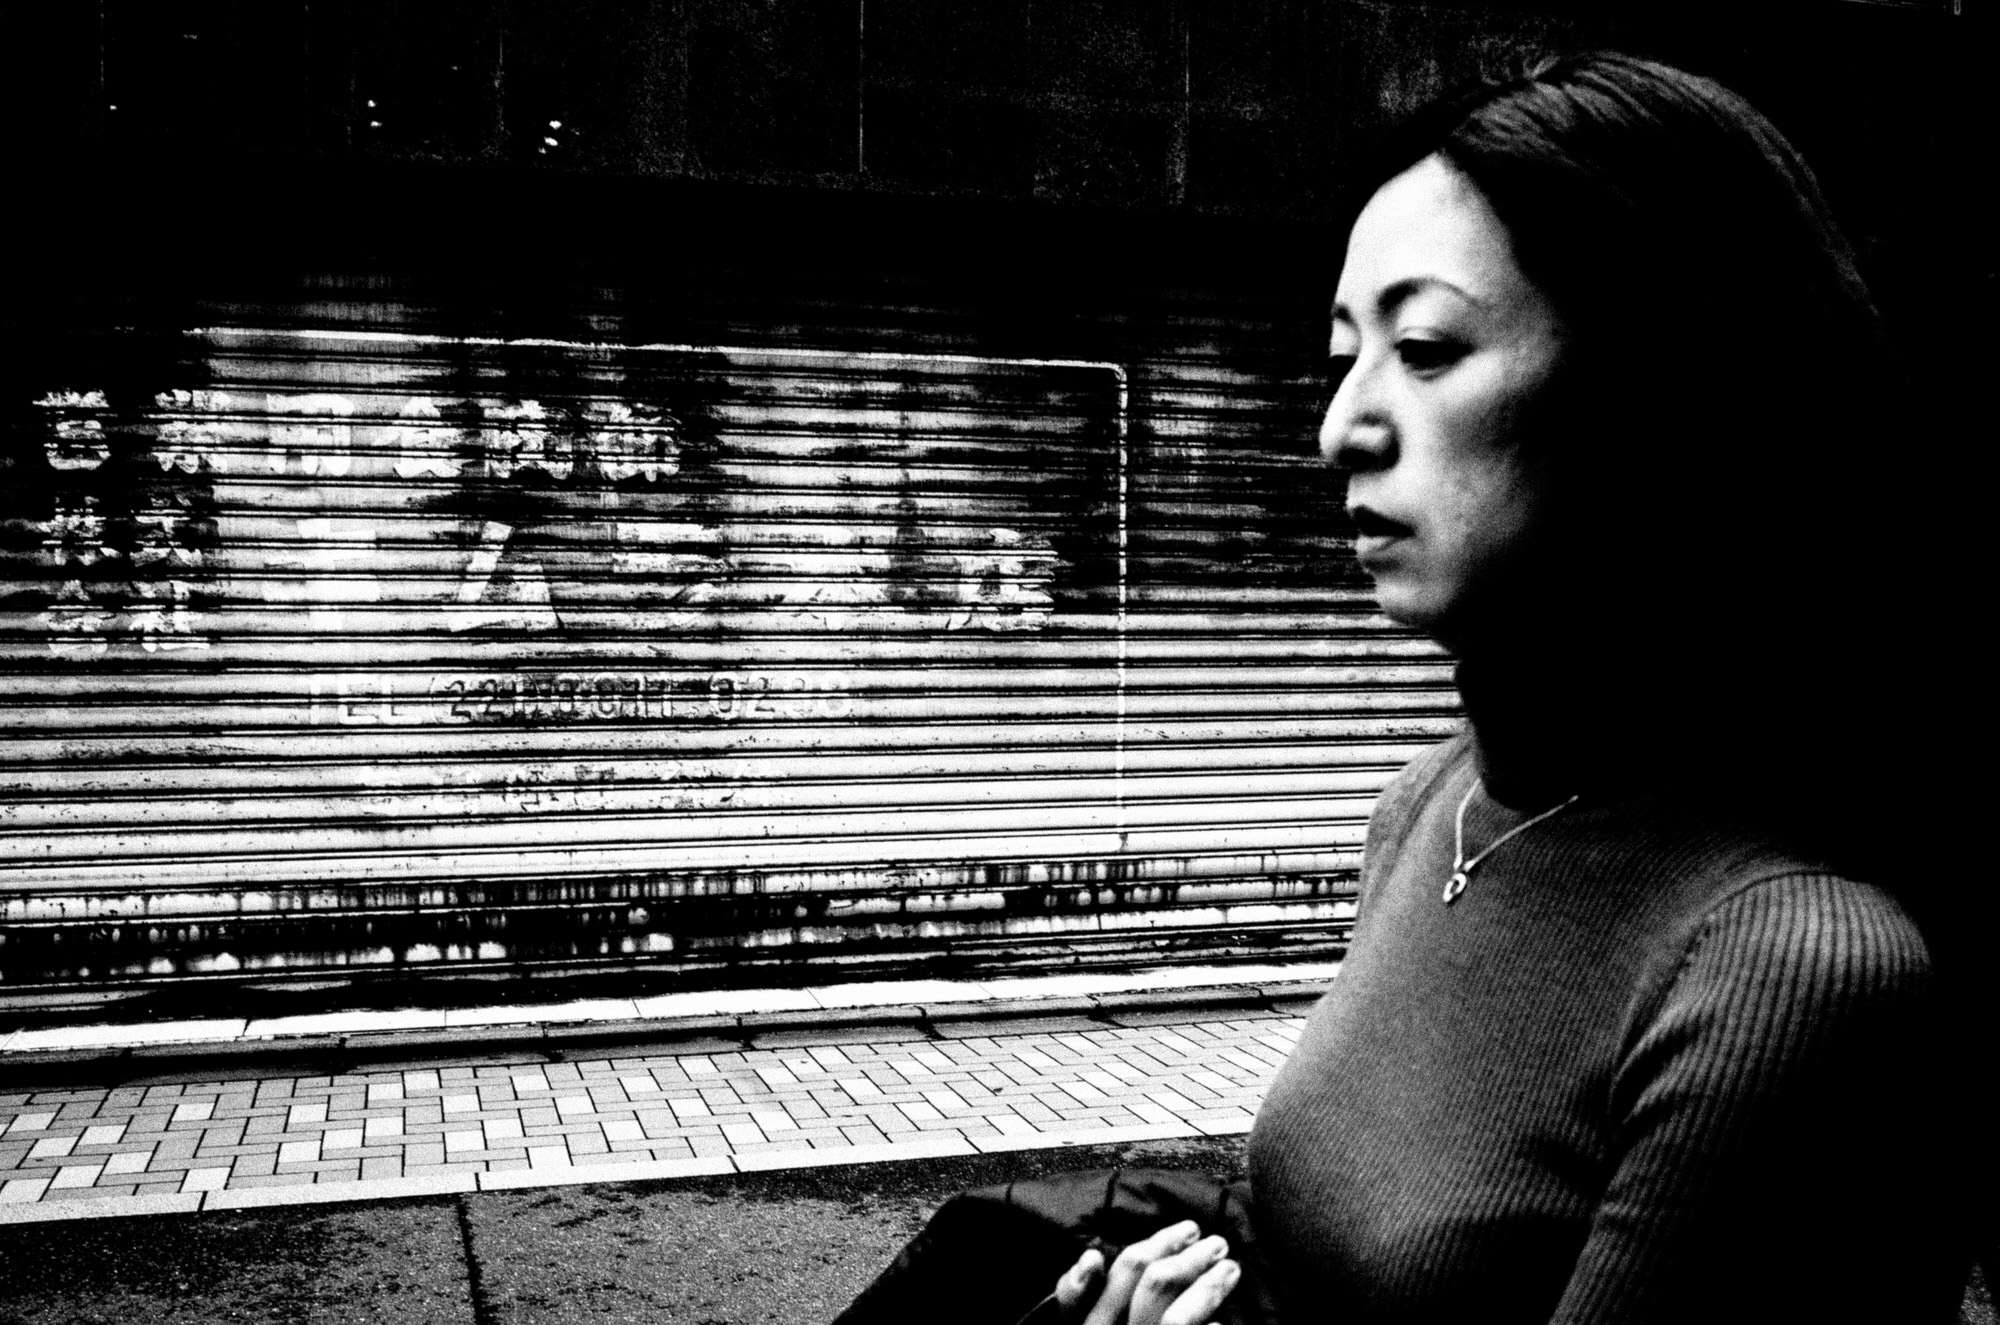 eric kim street photography kyoto-0001392